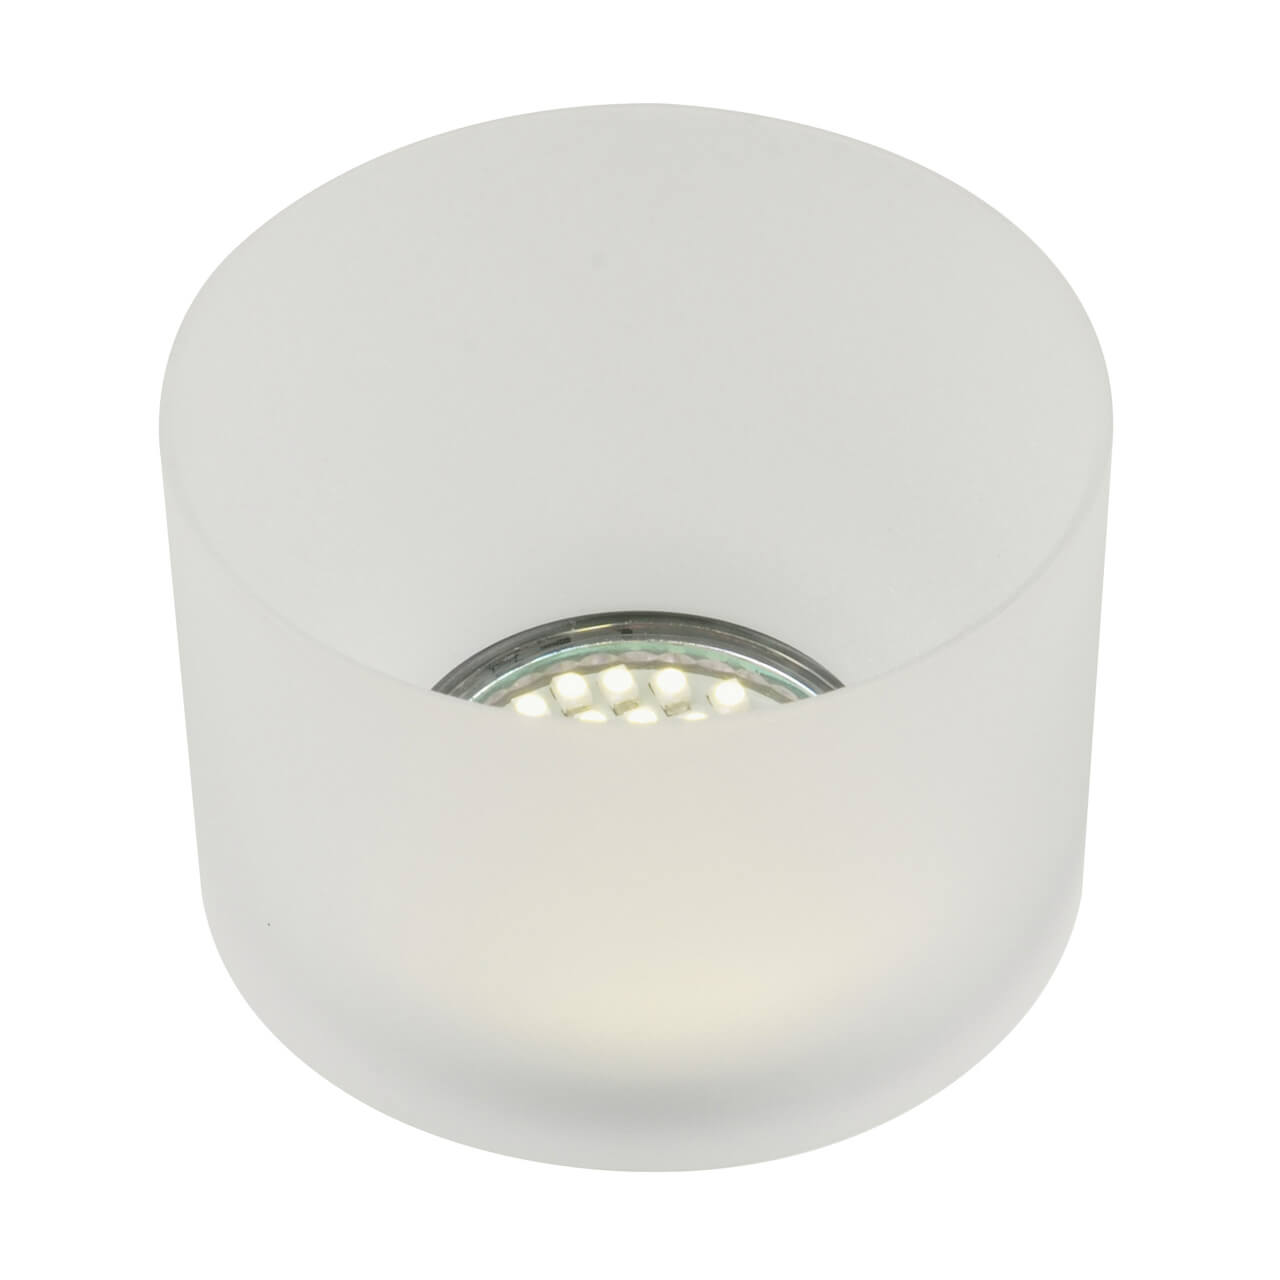 Встраиваемый светильник Fametto Nuvola DLS-N102 GU10 white/mat штатив deluxe dls 100b black white